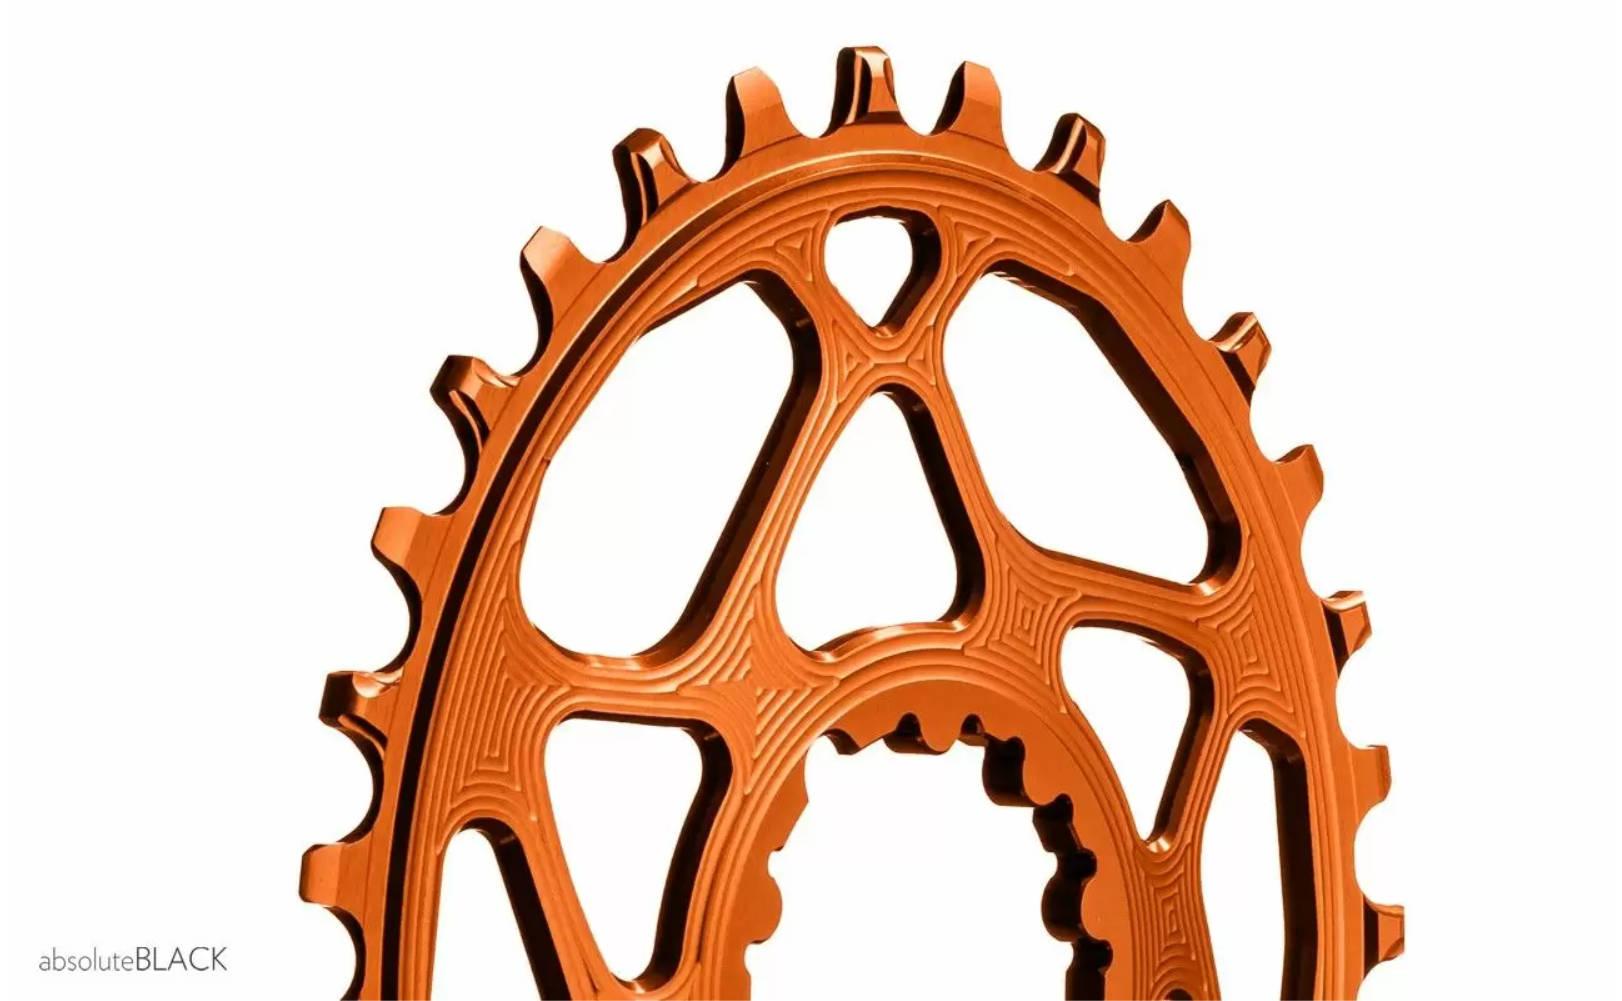 Chainring Absolute Black Oval SRAM DM Orange Boost 3mm Offset 32T